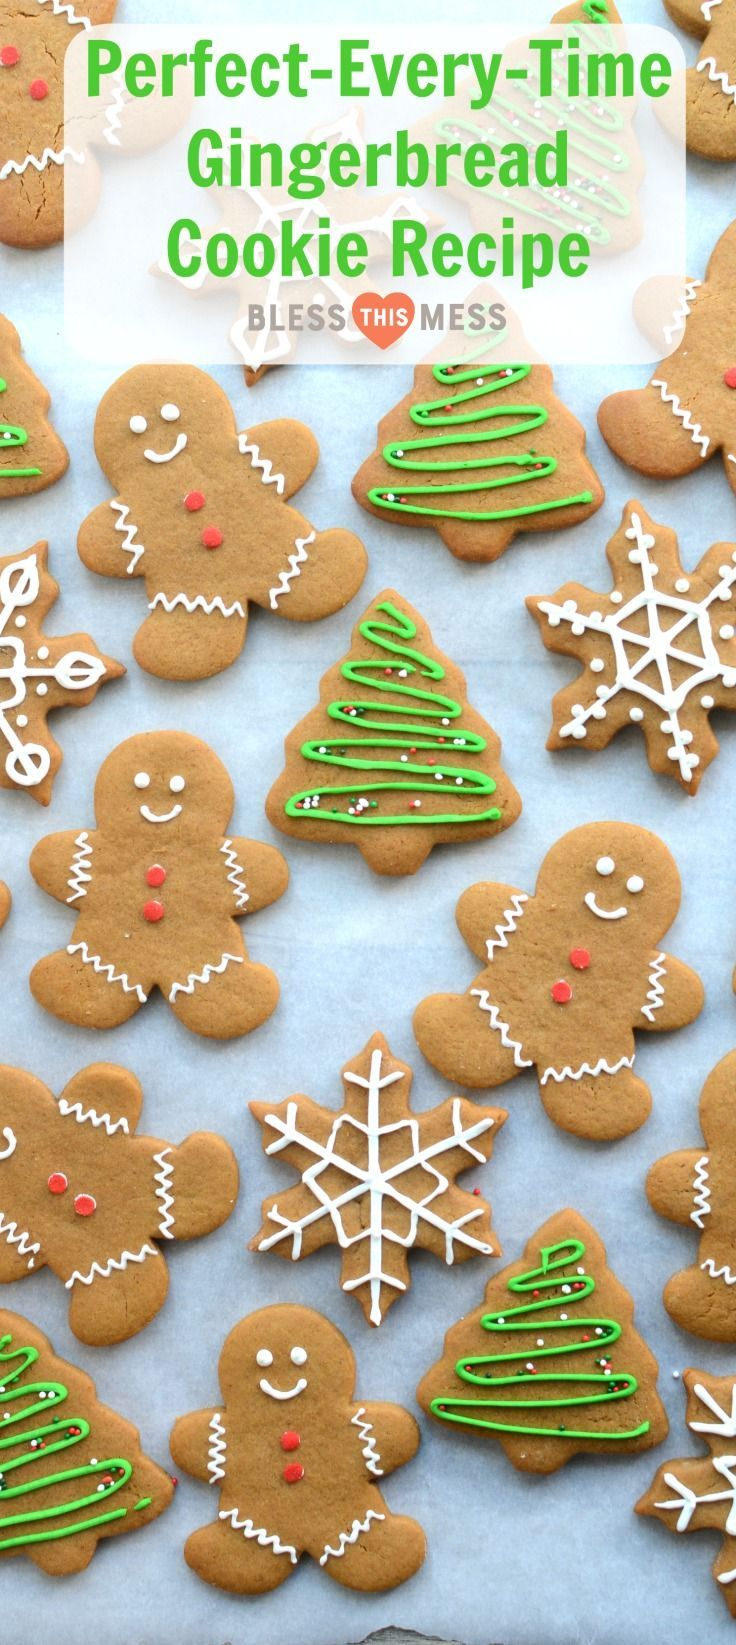 Classic Gingerbread Cookies Recipe | Soft Gingerbread Cookies